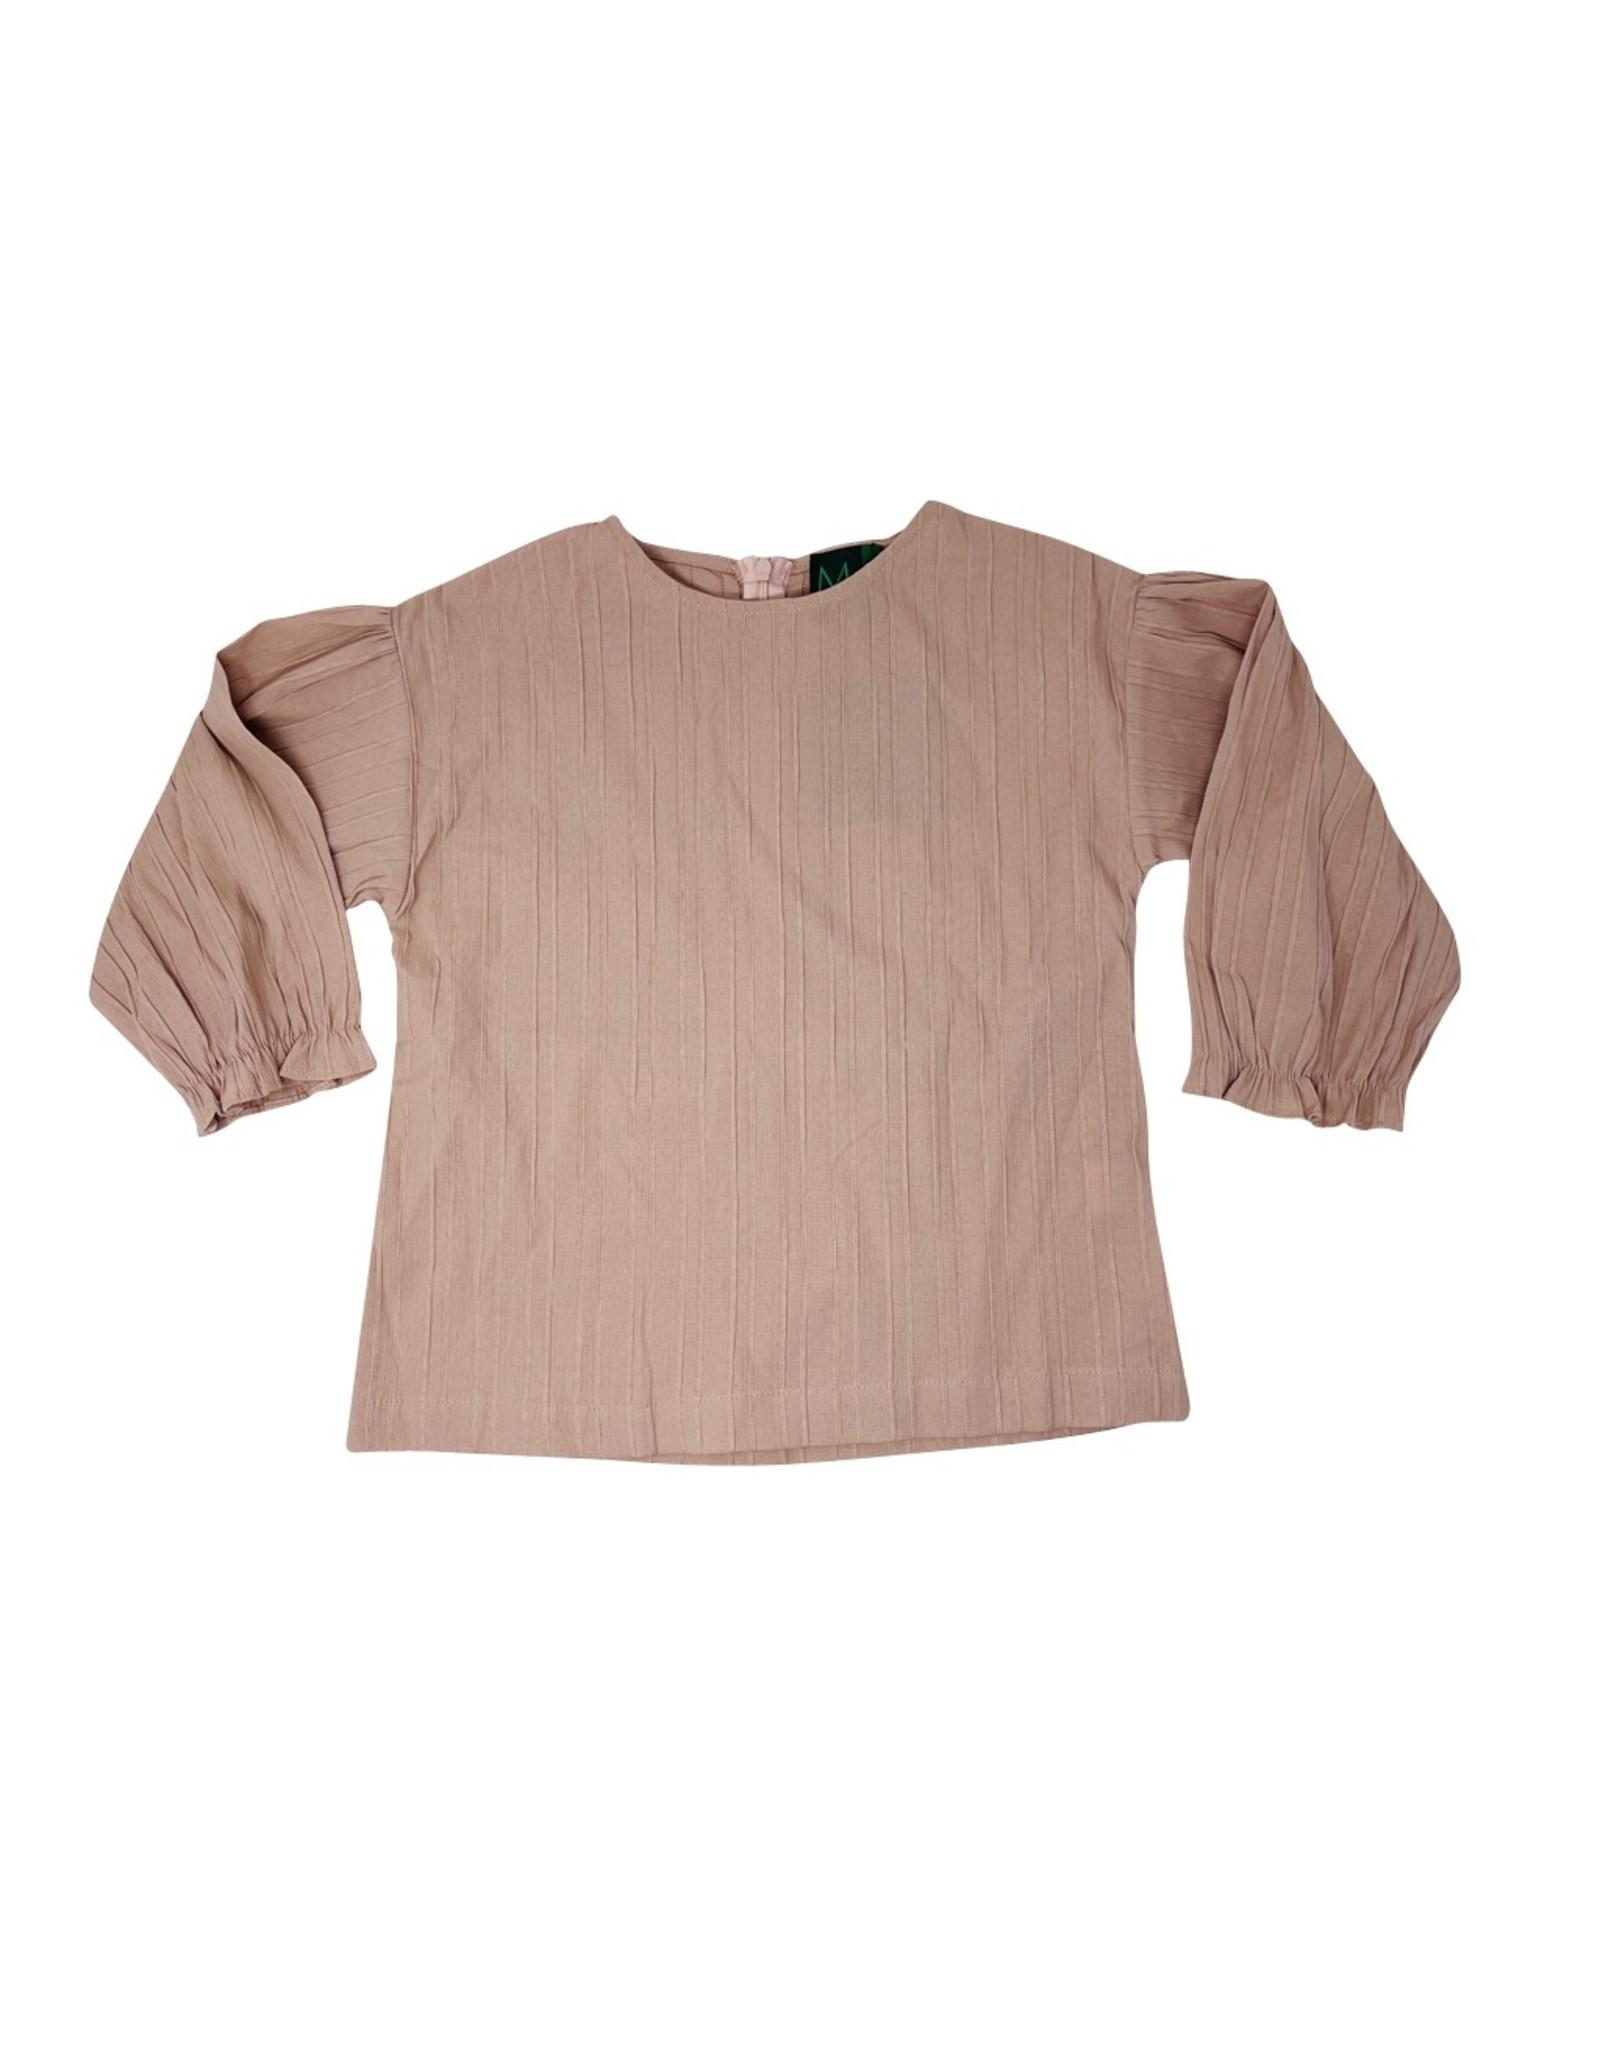 Miss Meme Miss Meme Dressy Ribbed Top with Ruffle Sleeve